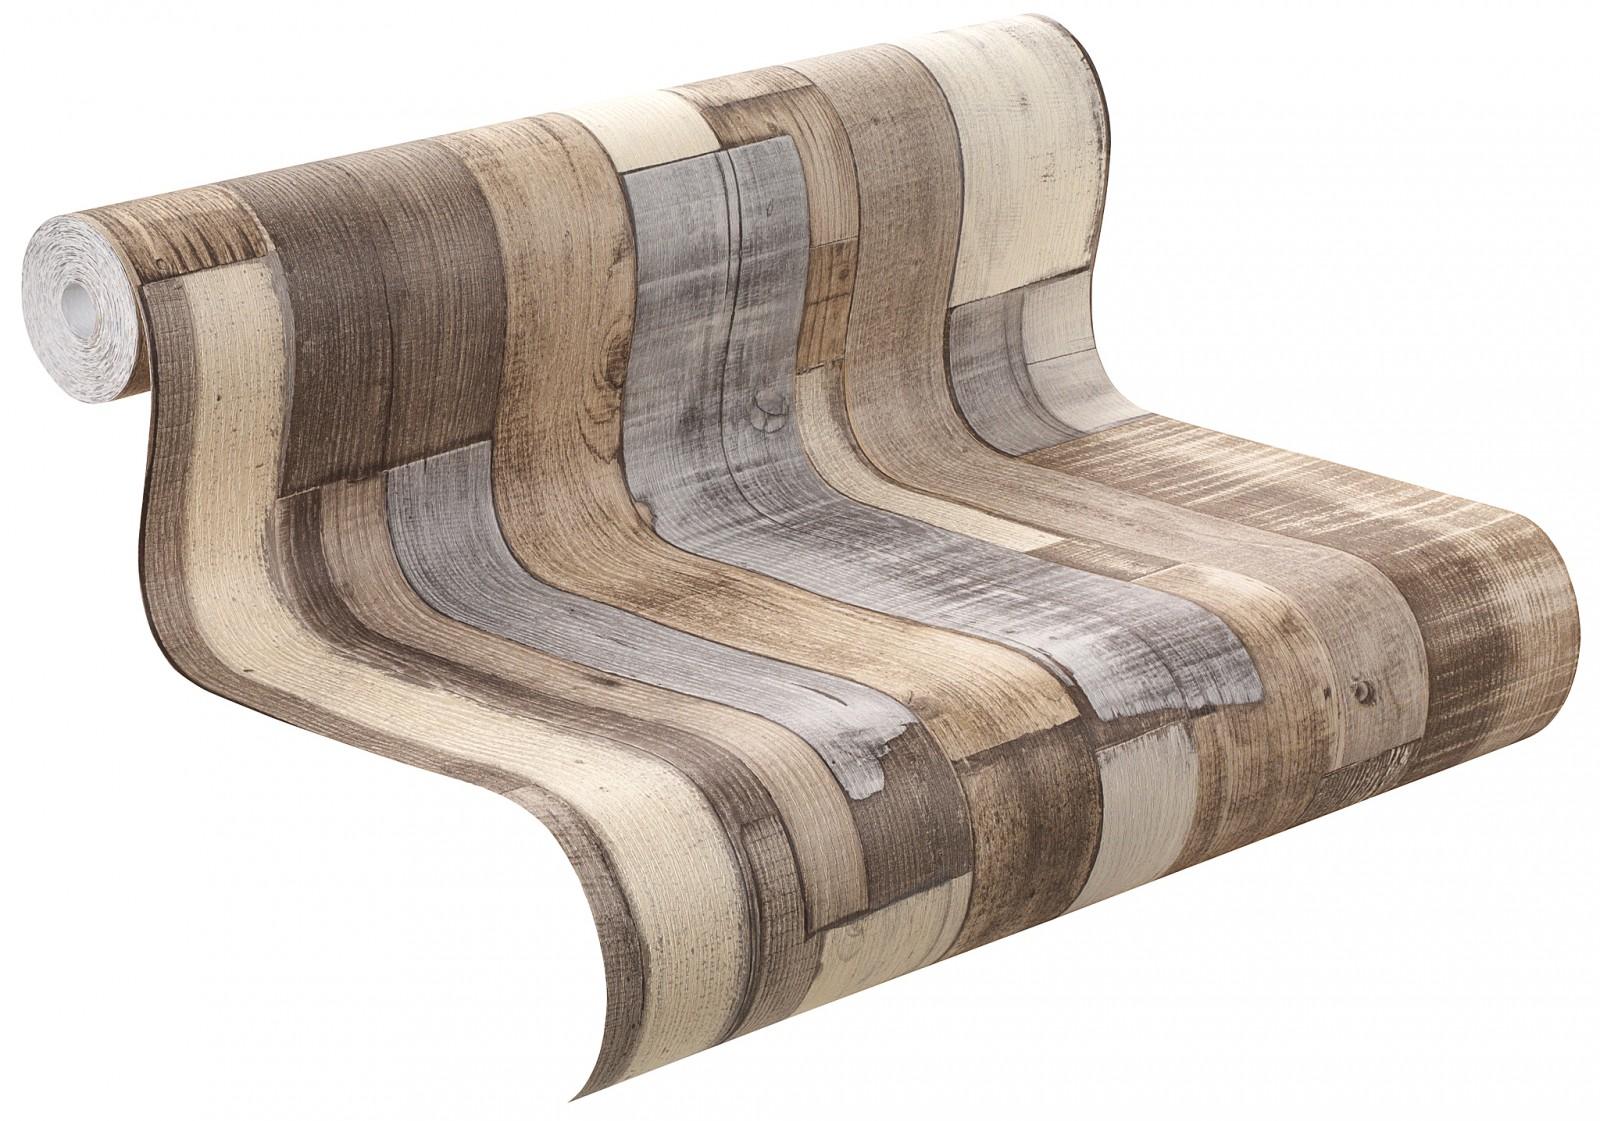 vliestapete holz grau braun factory rasch 446753. Black Bedroom Furniture Sets. Home Design Ideas